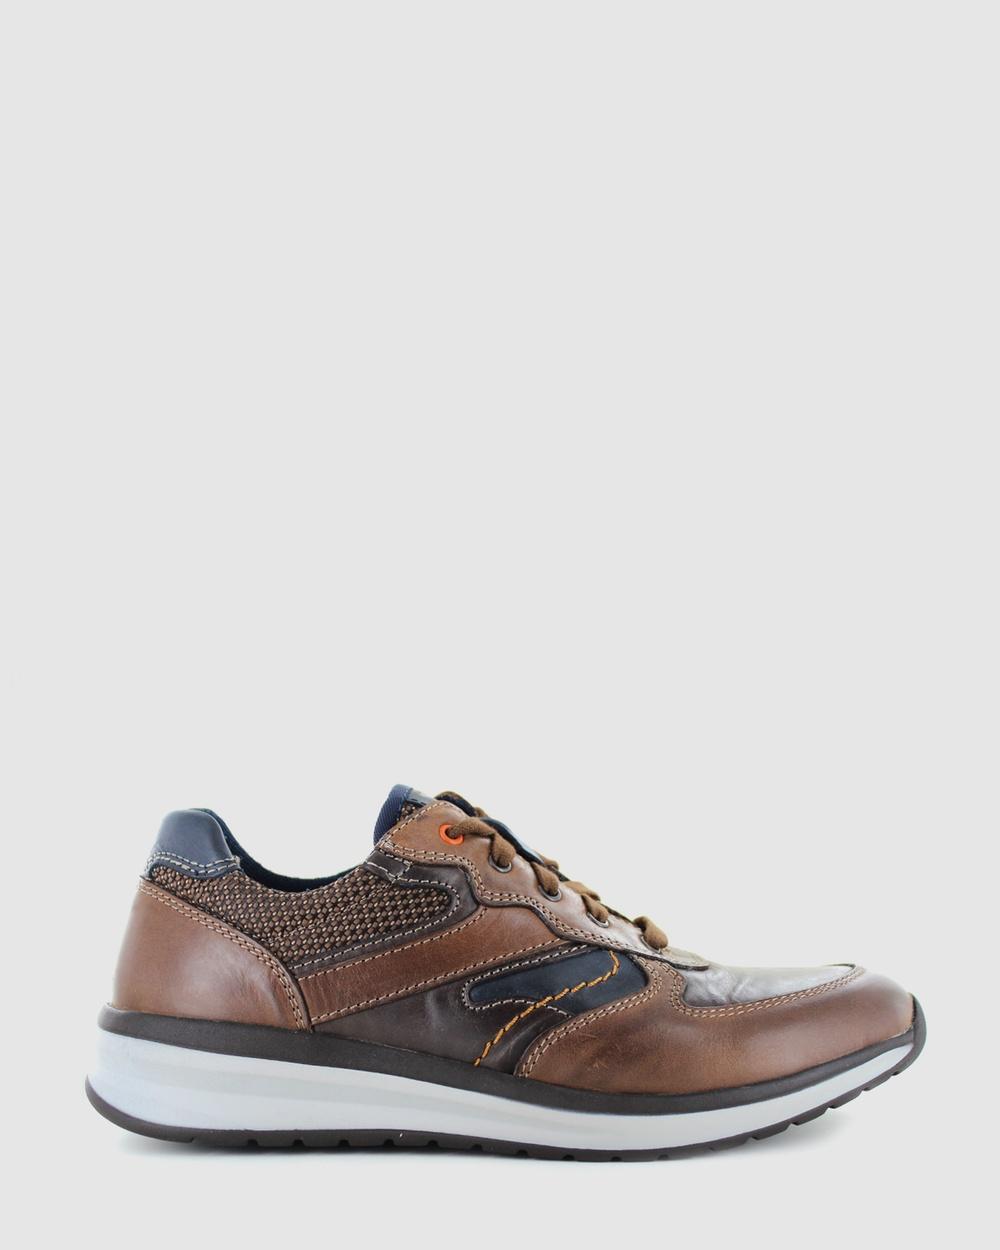 Wild Rhino Otway Casual Shoes Brown Australia